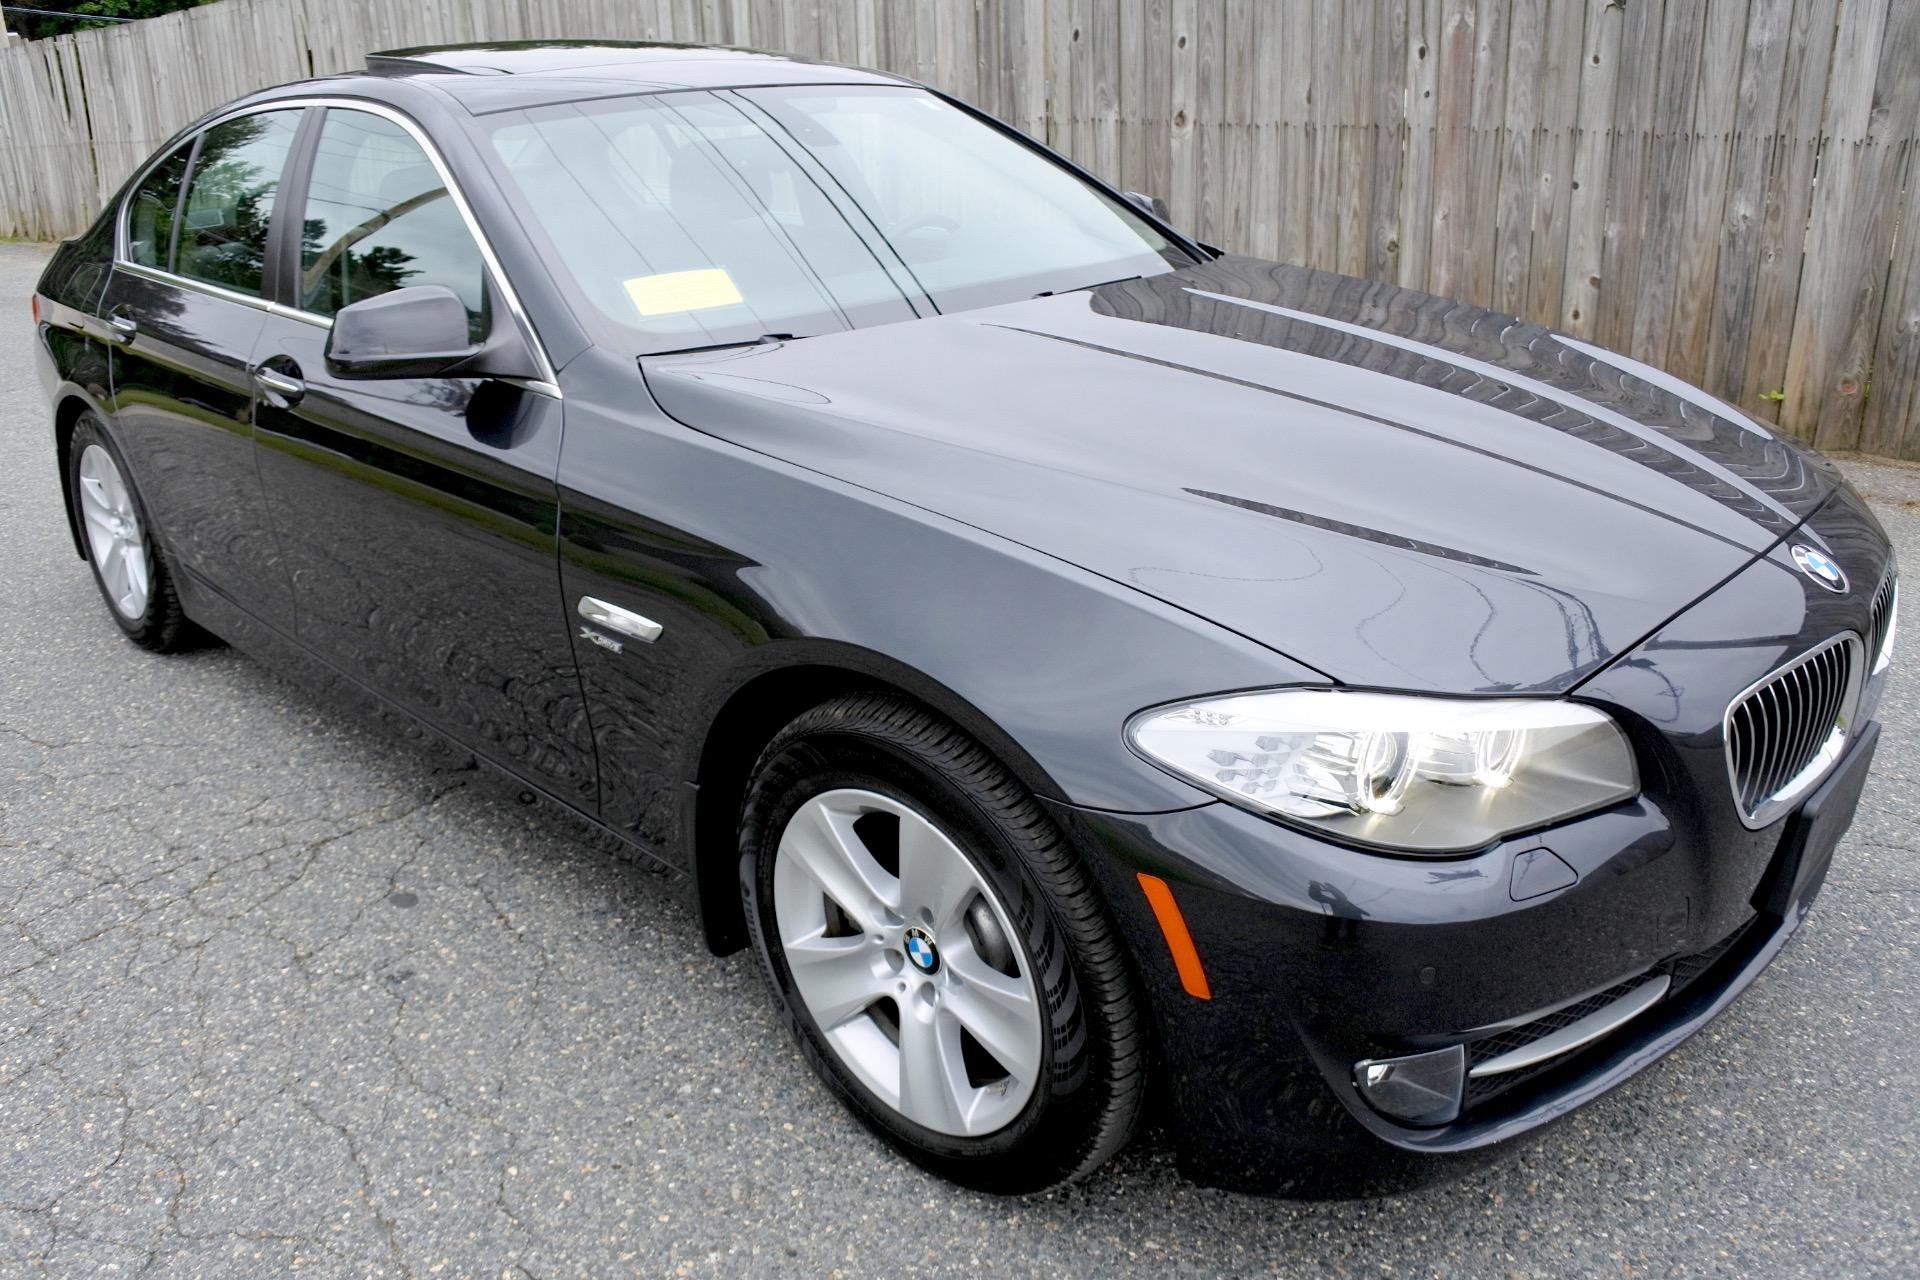 Used 2012 BMW 5 Series 528i xDrive AWD Used 2012 BMW 5 Series 528i xDrive AWD for sale  at Metro West Motorcars LLC in Shrewsbury MA 7